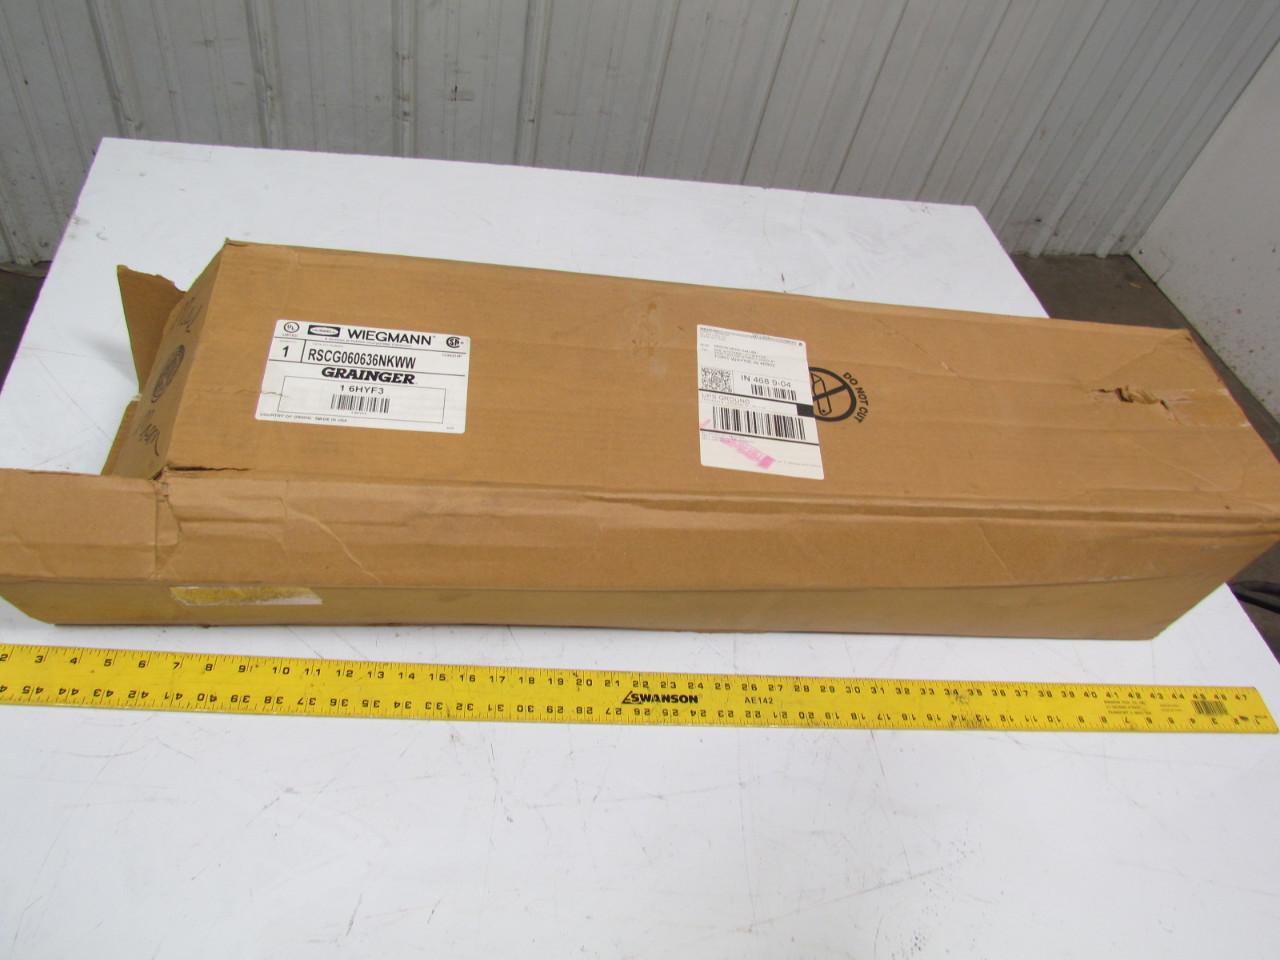 Wiegmann Wiring Trough Diagrams For Dummies Nema 3r Rsc060636nkww Electrical Box Wire